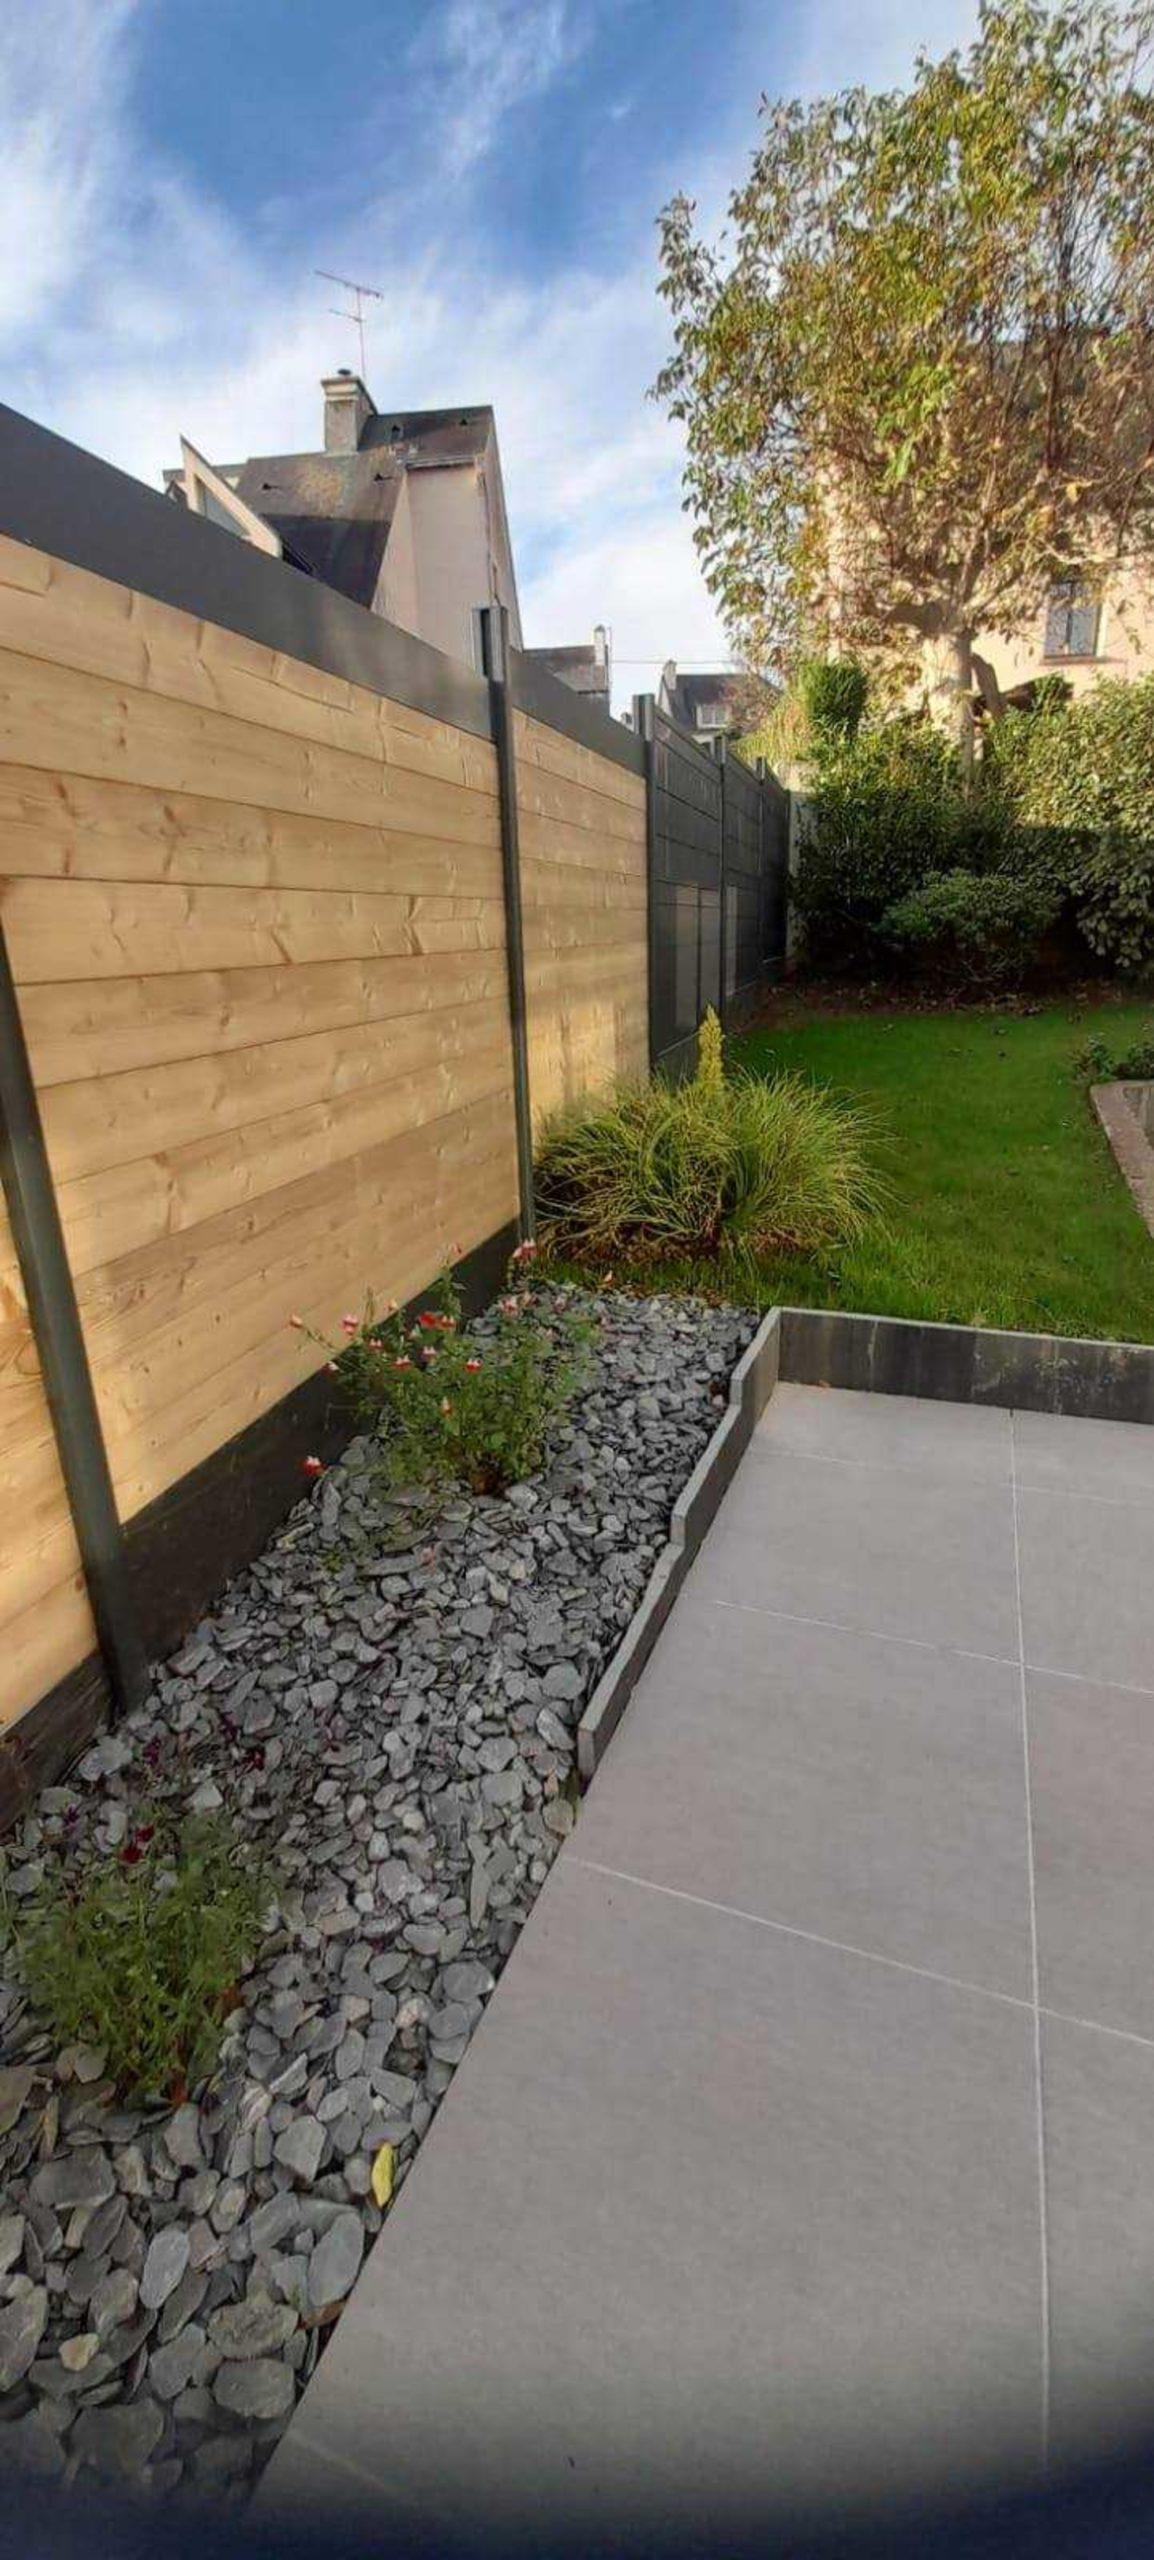 Dallage, bordure, palissade bois, terrasse dallée